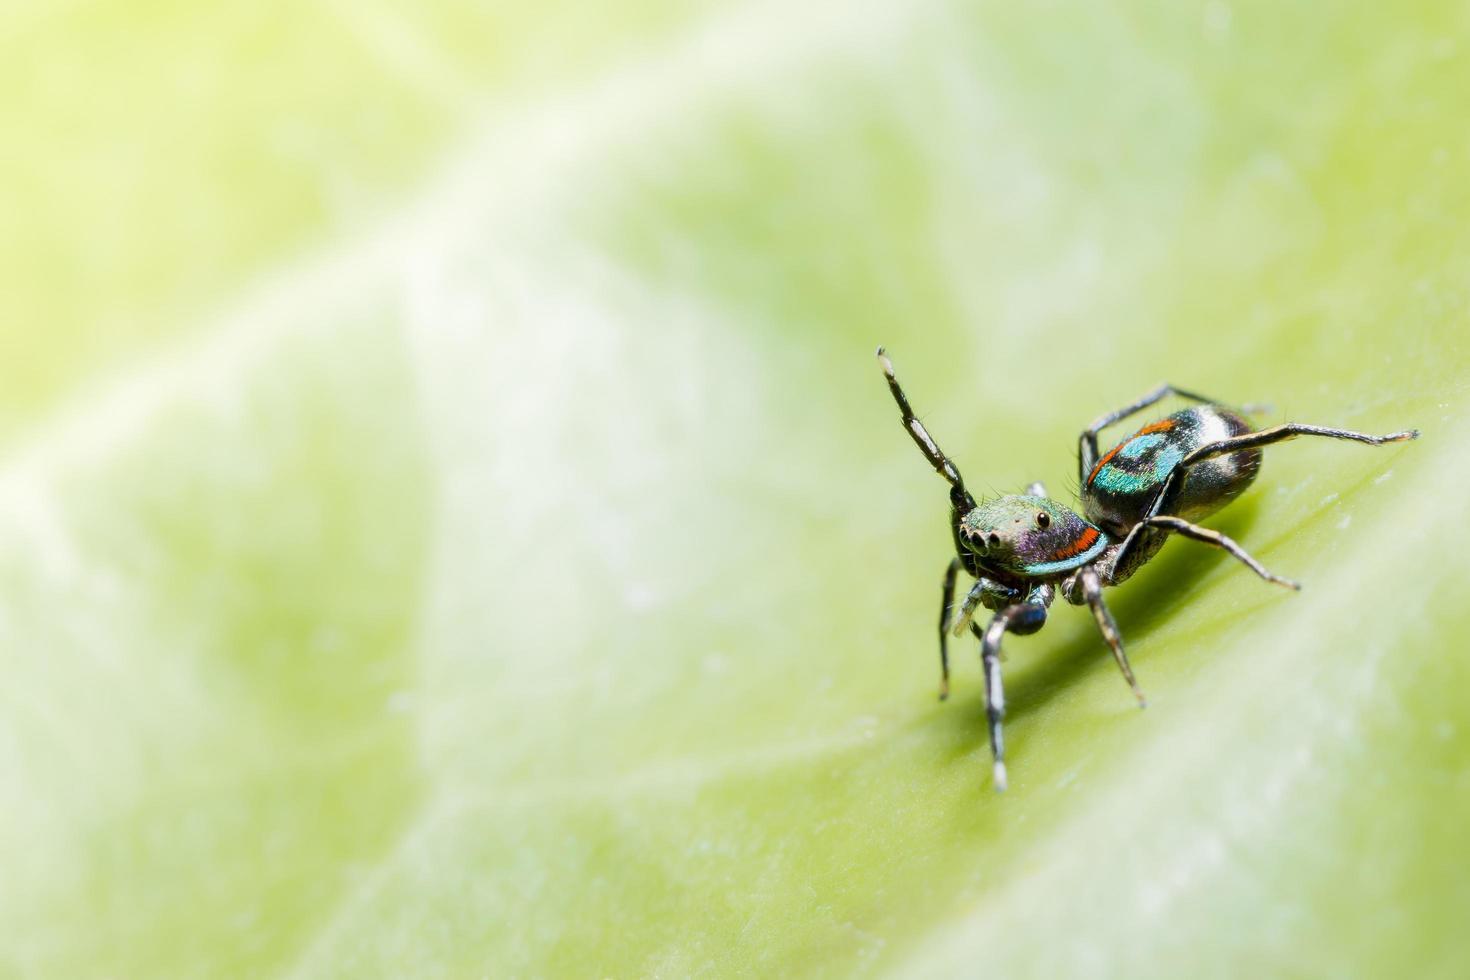 araignée sur feuille verte photo